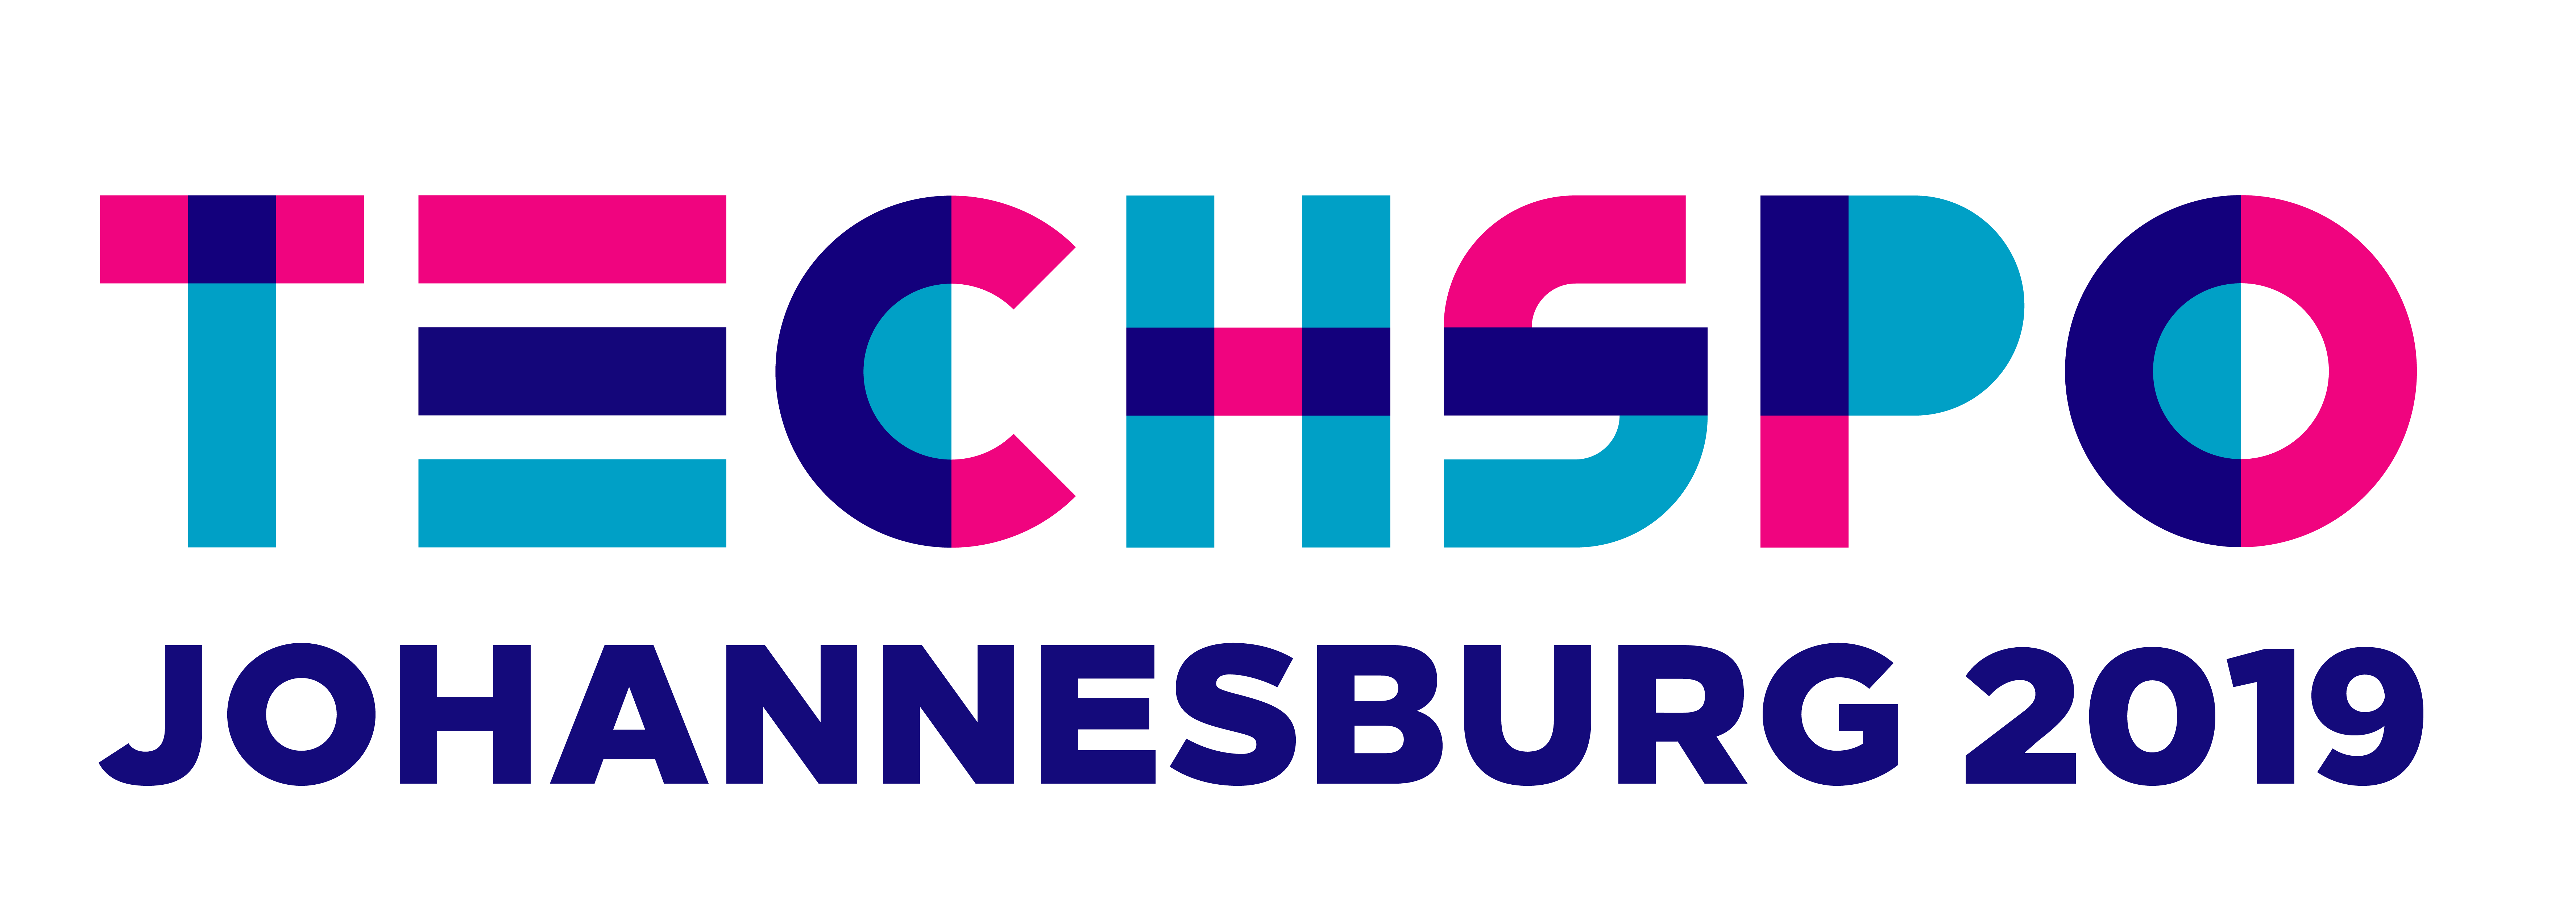 TECHSPO Johannesburg 2022